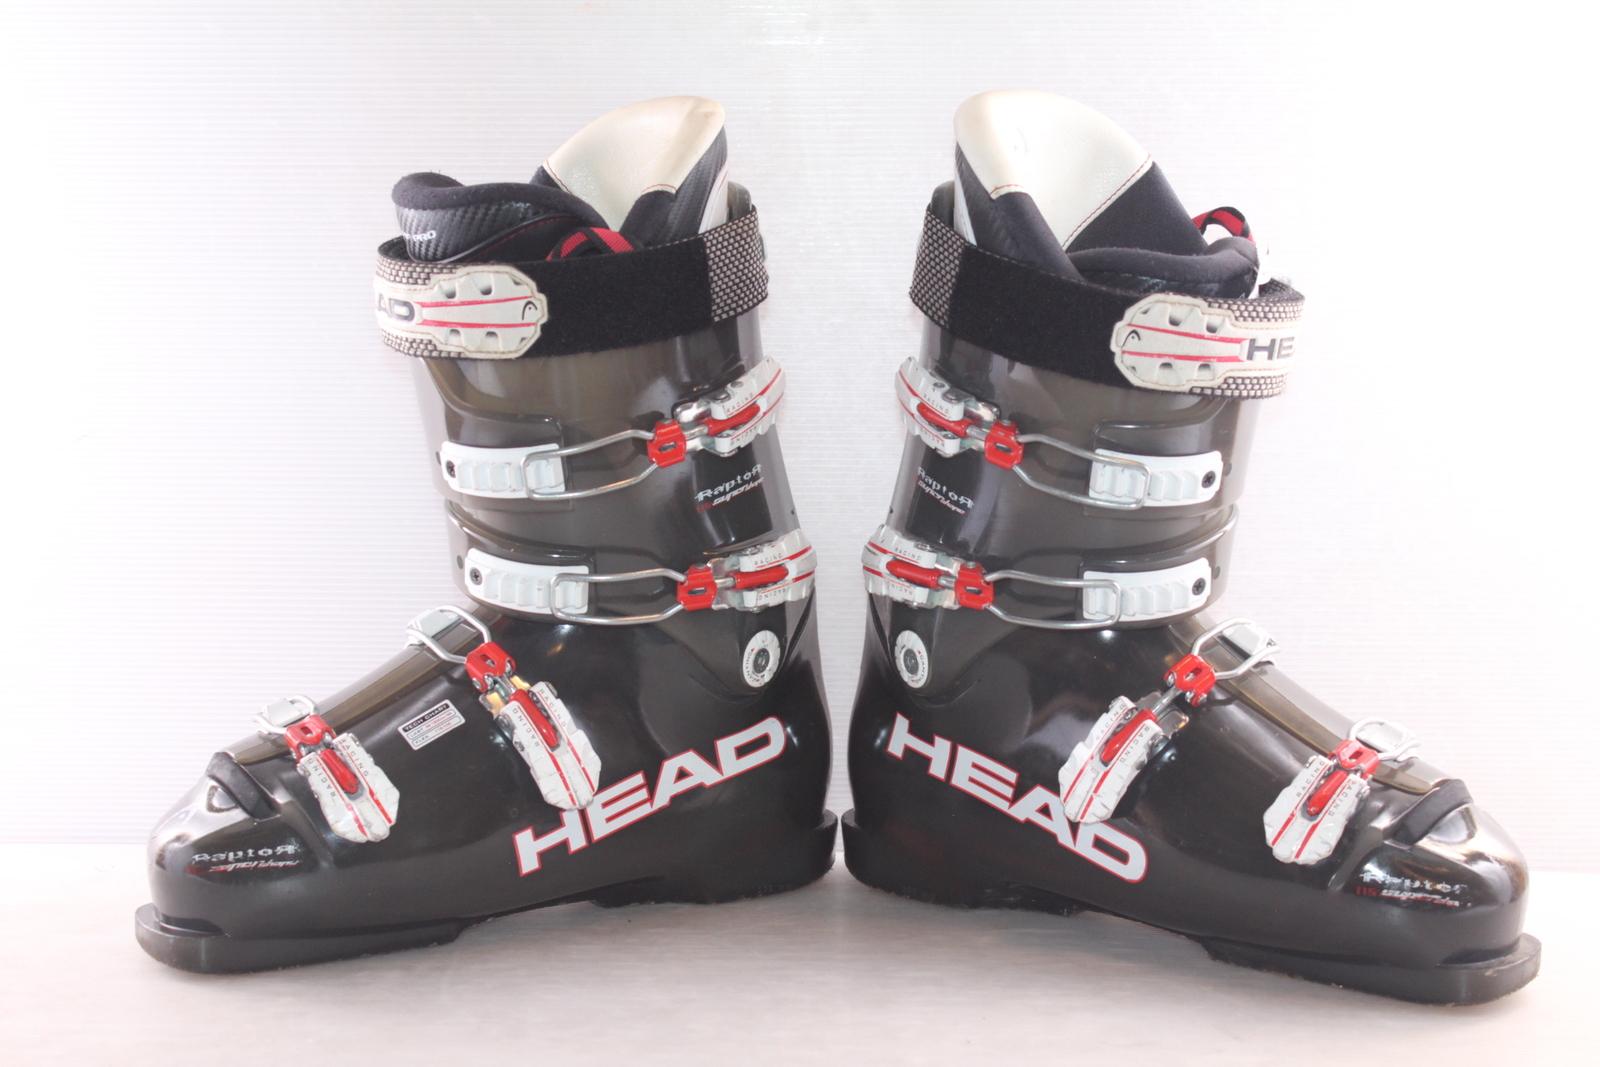 Lyžařské boty Head Raptor 115 Supershape vel. EU44.5 flexe 115